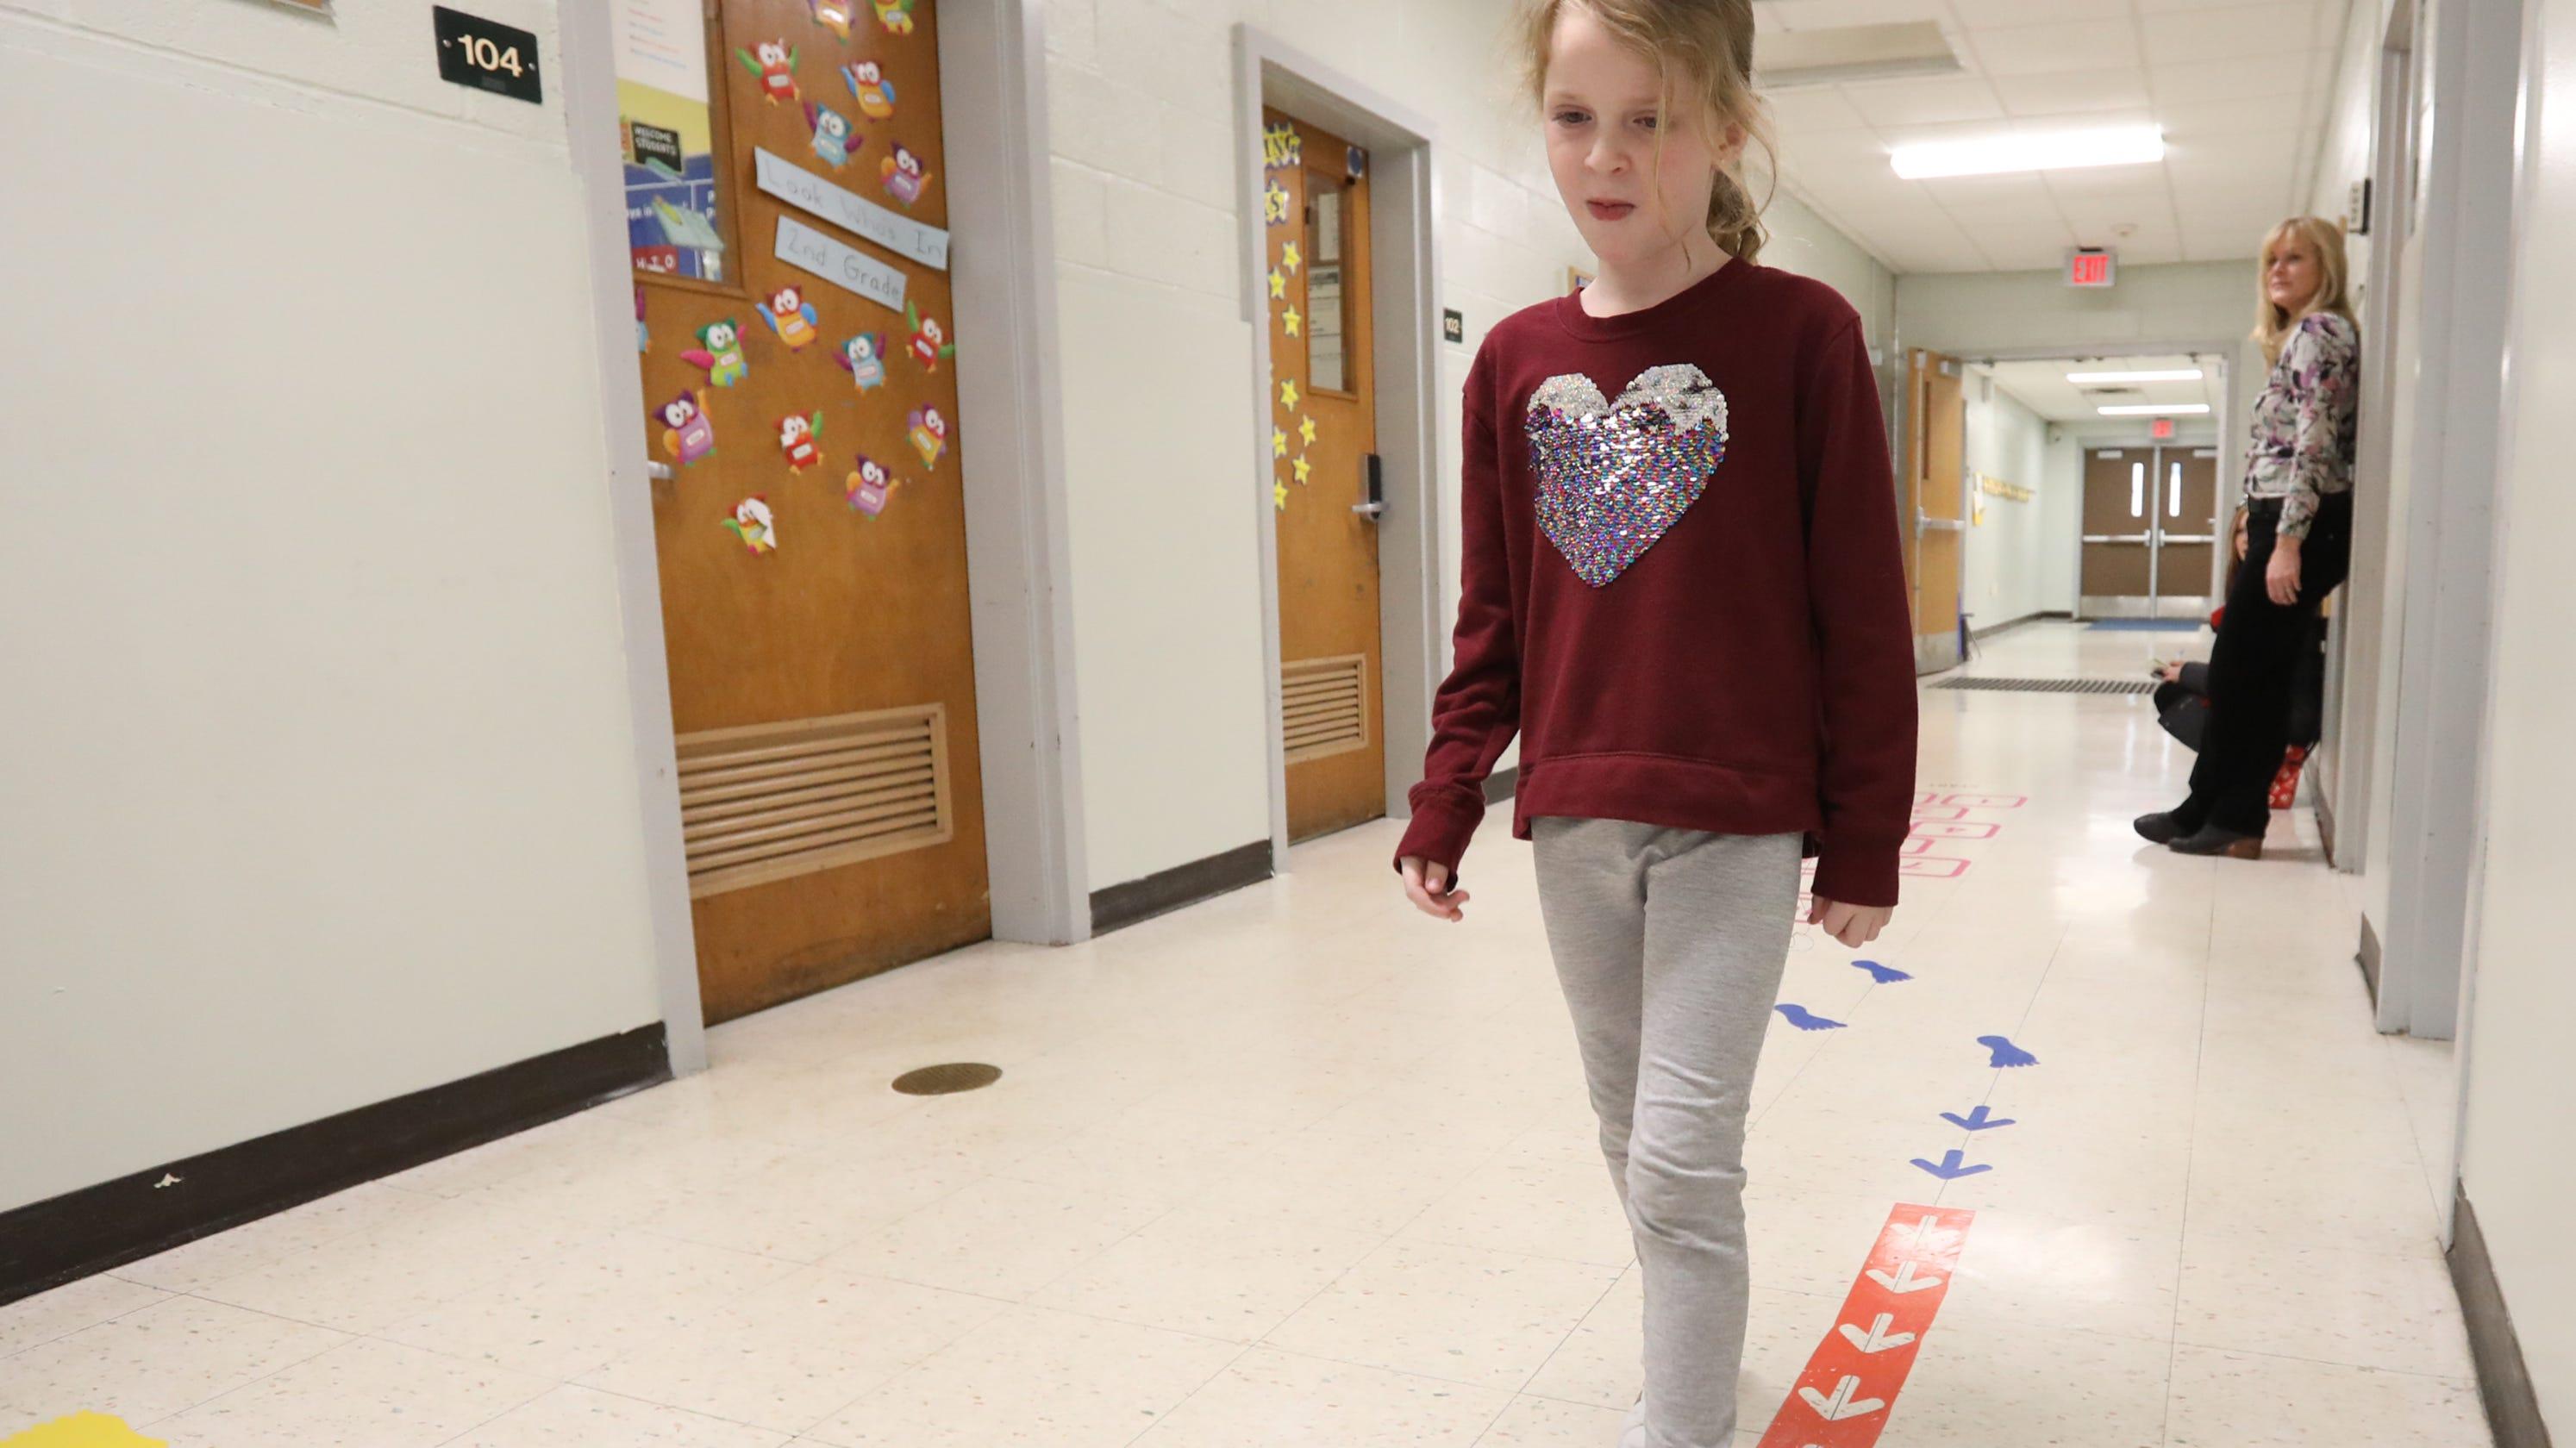 Better Grades In A Minute: Sensory Hallway At Suffern School